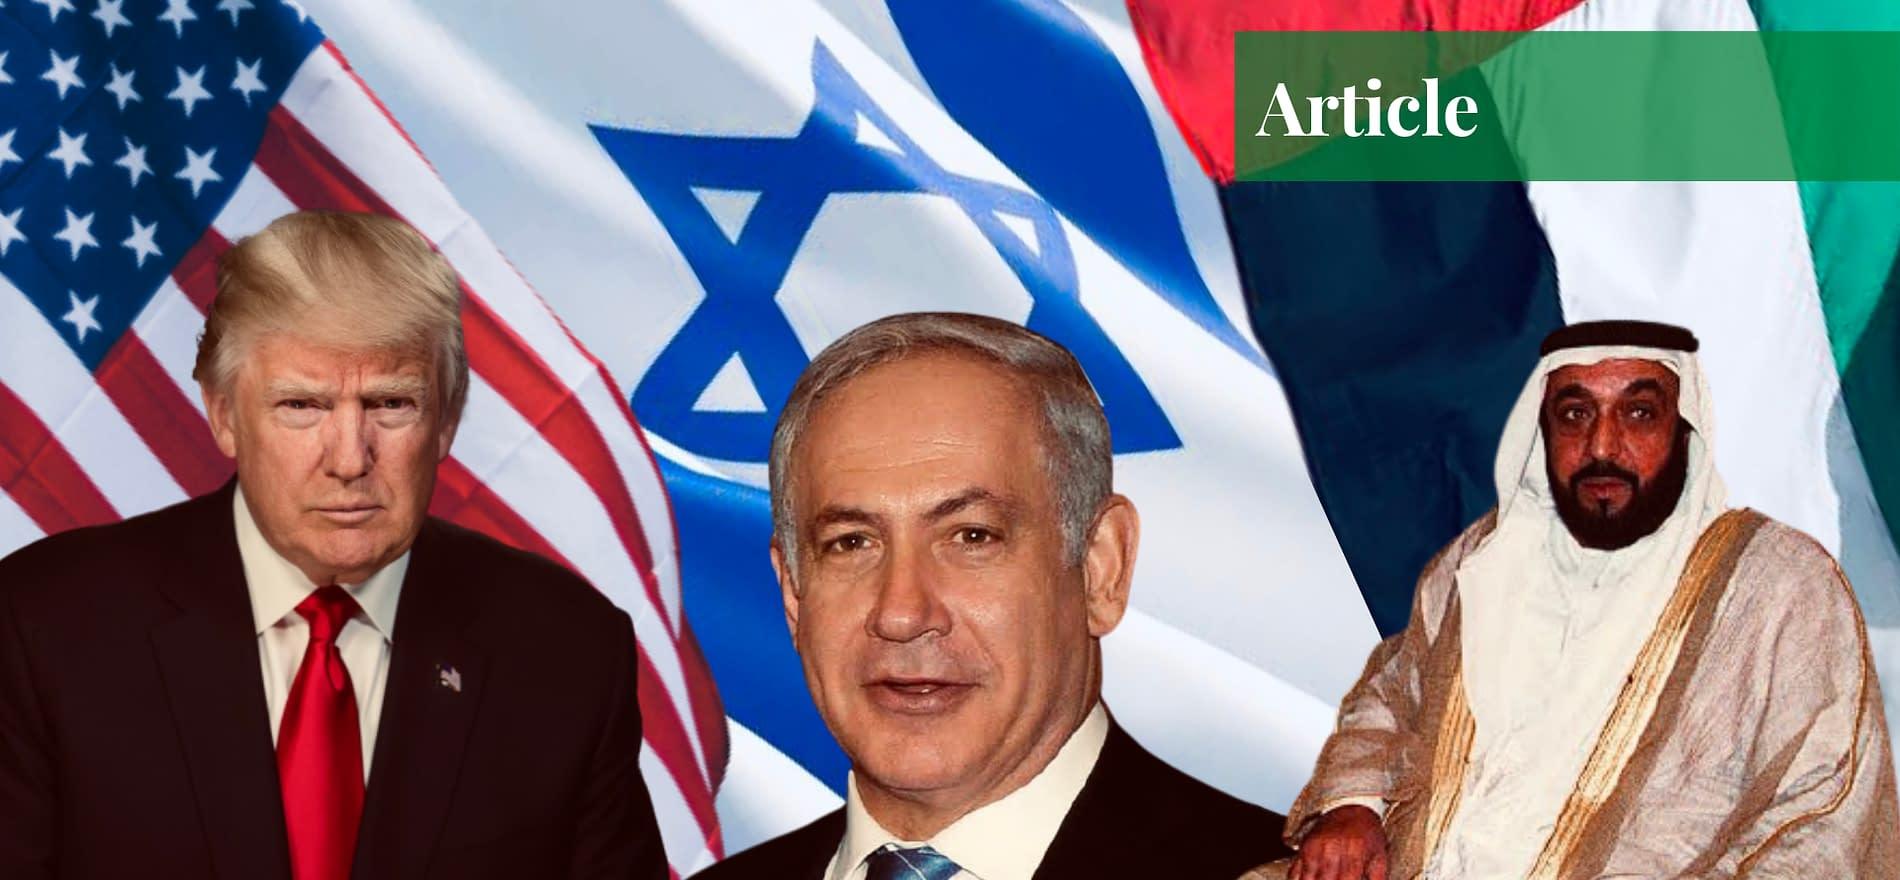 Arab israel relations